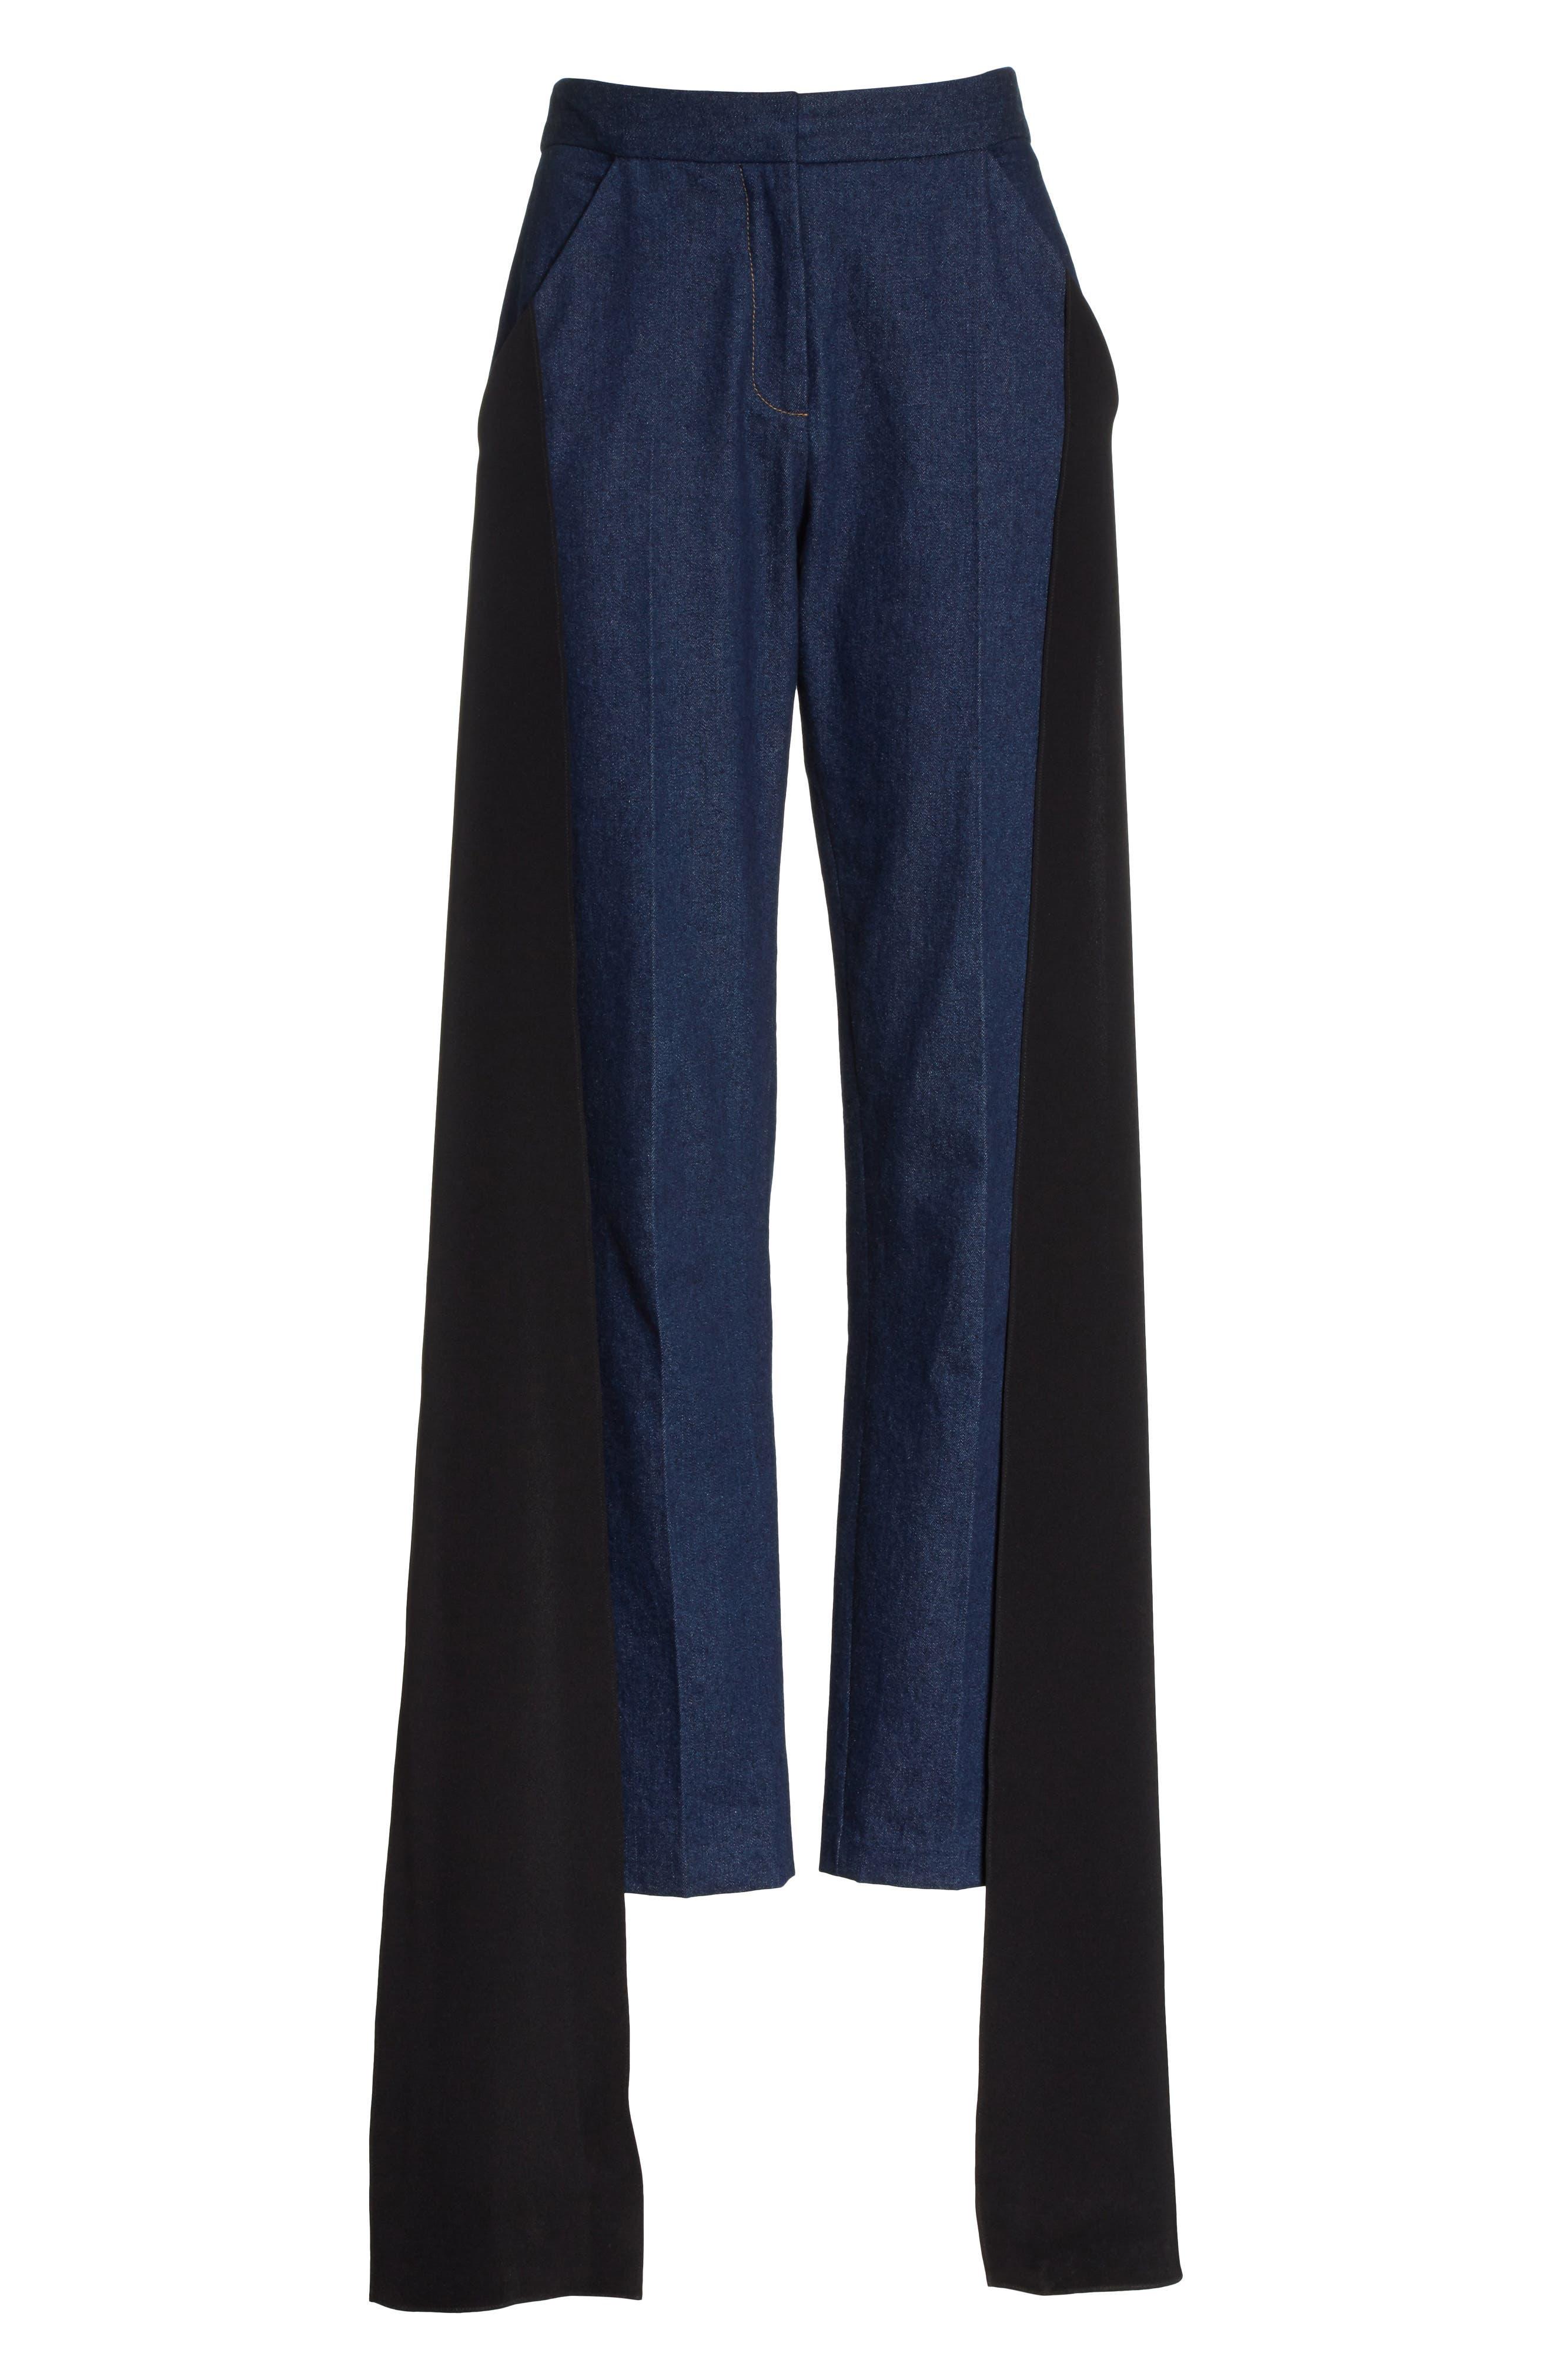 Mojave Side Panel Skinny Jeans,                             Alternate thumbnail 8, color,                             Dark Wash Denim